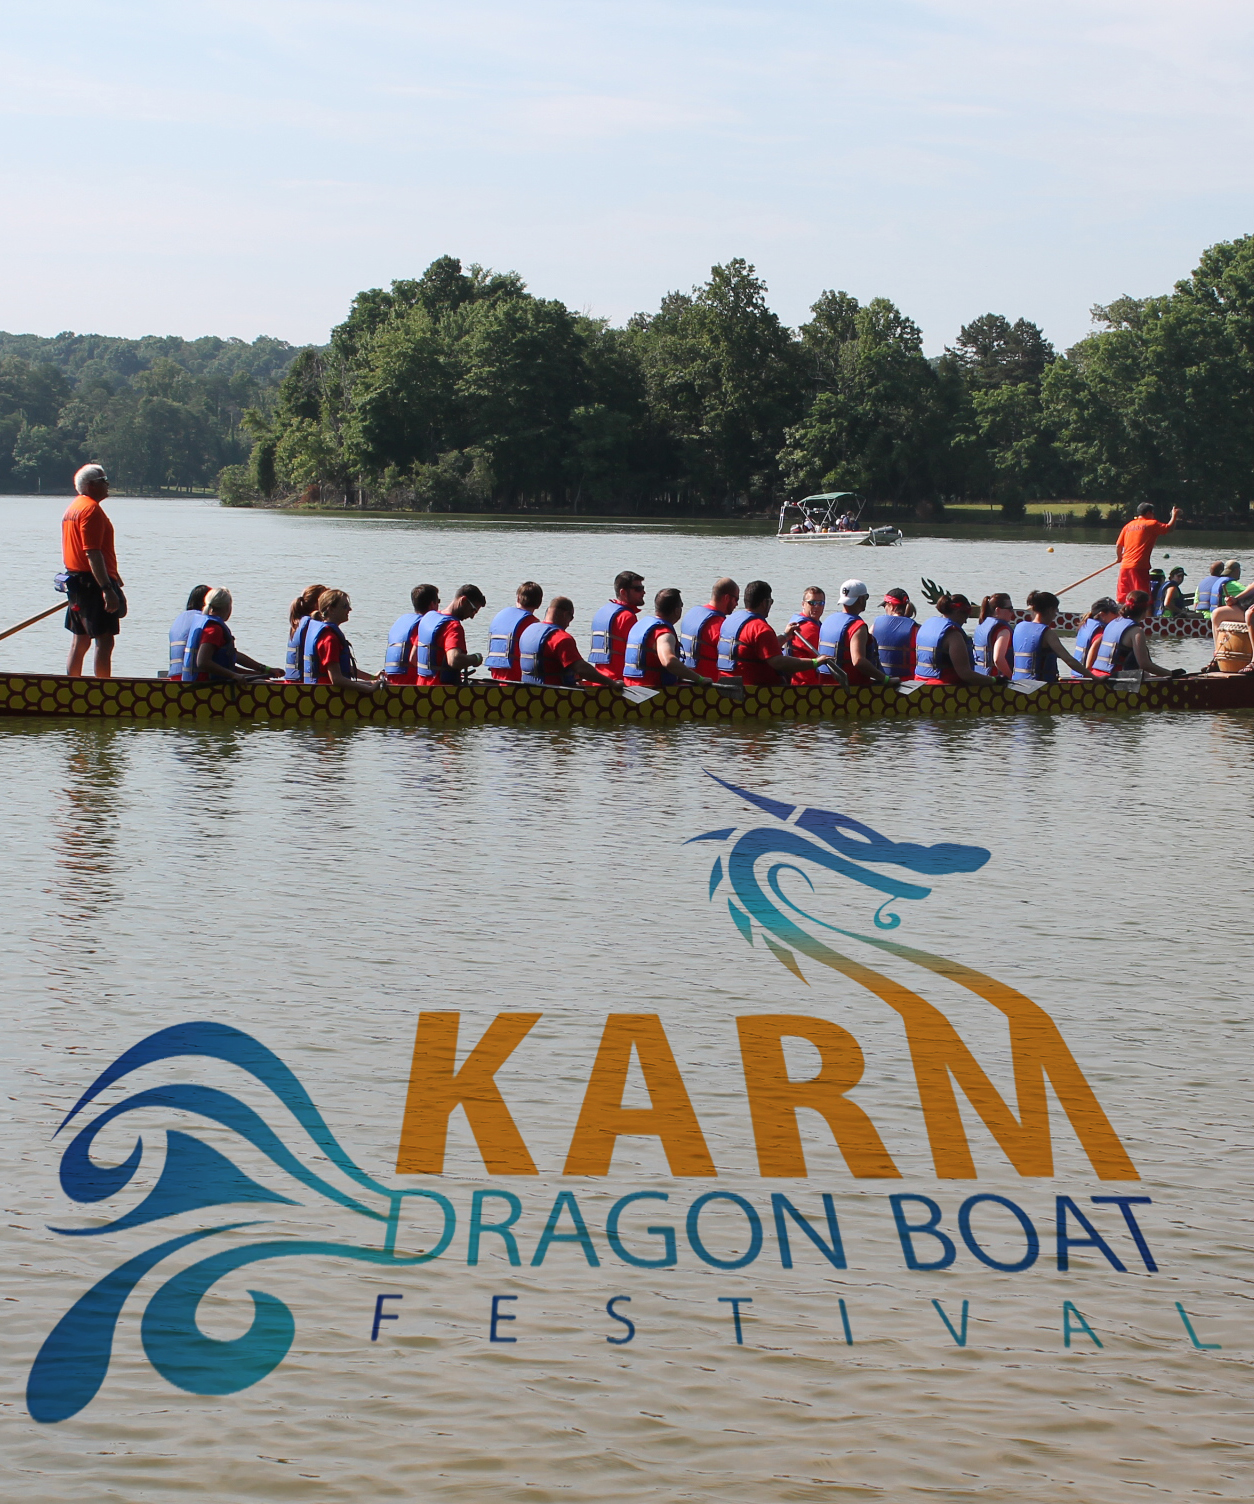 KARM Dragon Boat Festival